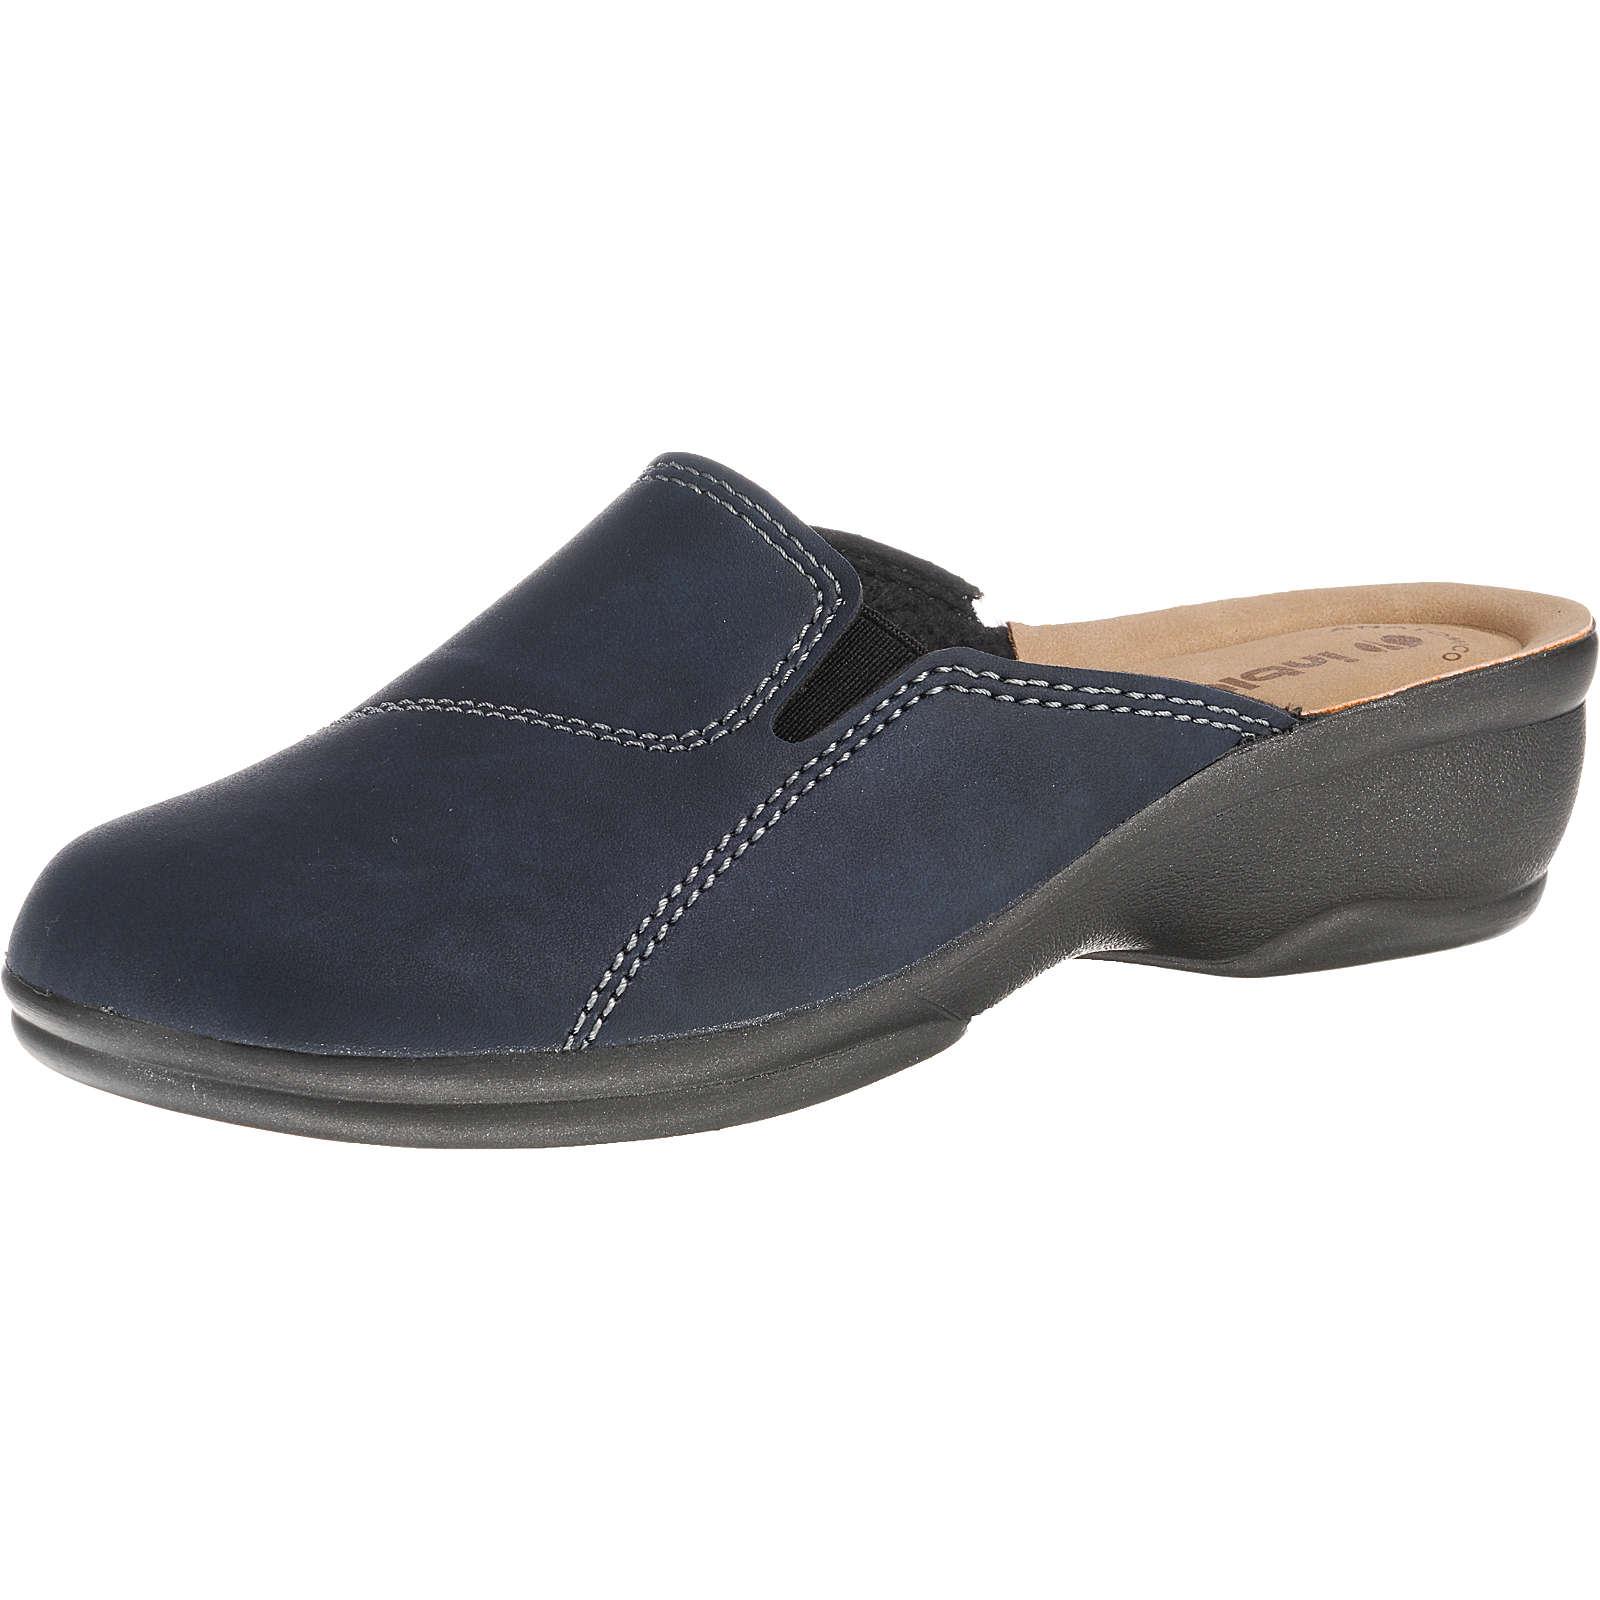 INBLU Pantoffeln blue denim Damen Gr. 37